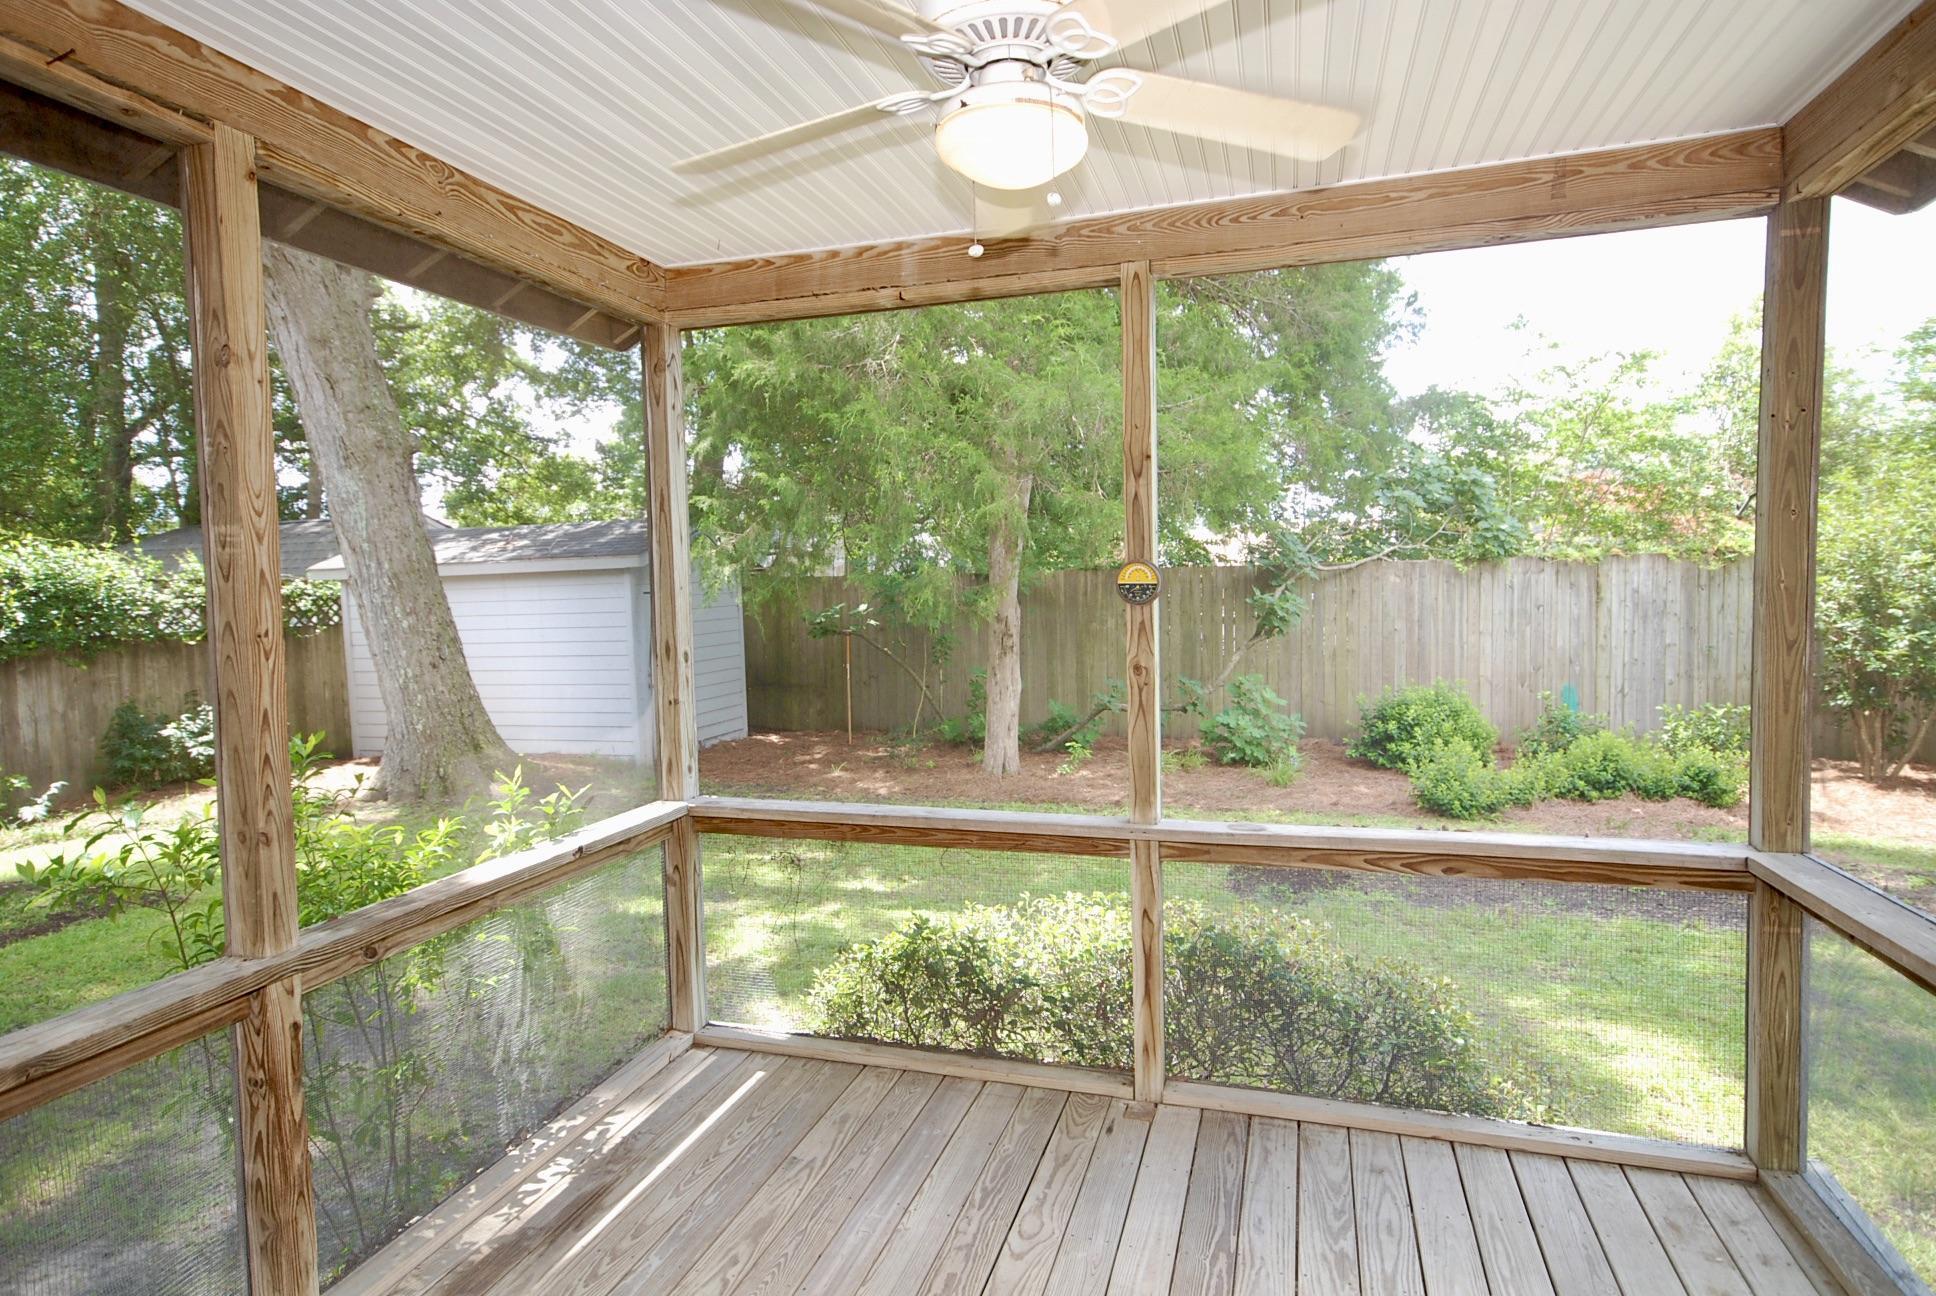 Carolina Terrace Homes For Sale - 28 Lolandra, Charleston, SC - 14